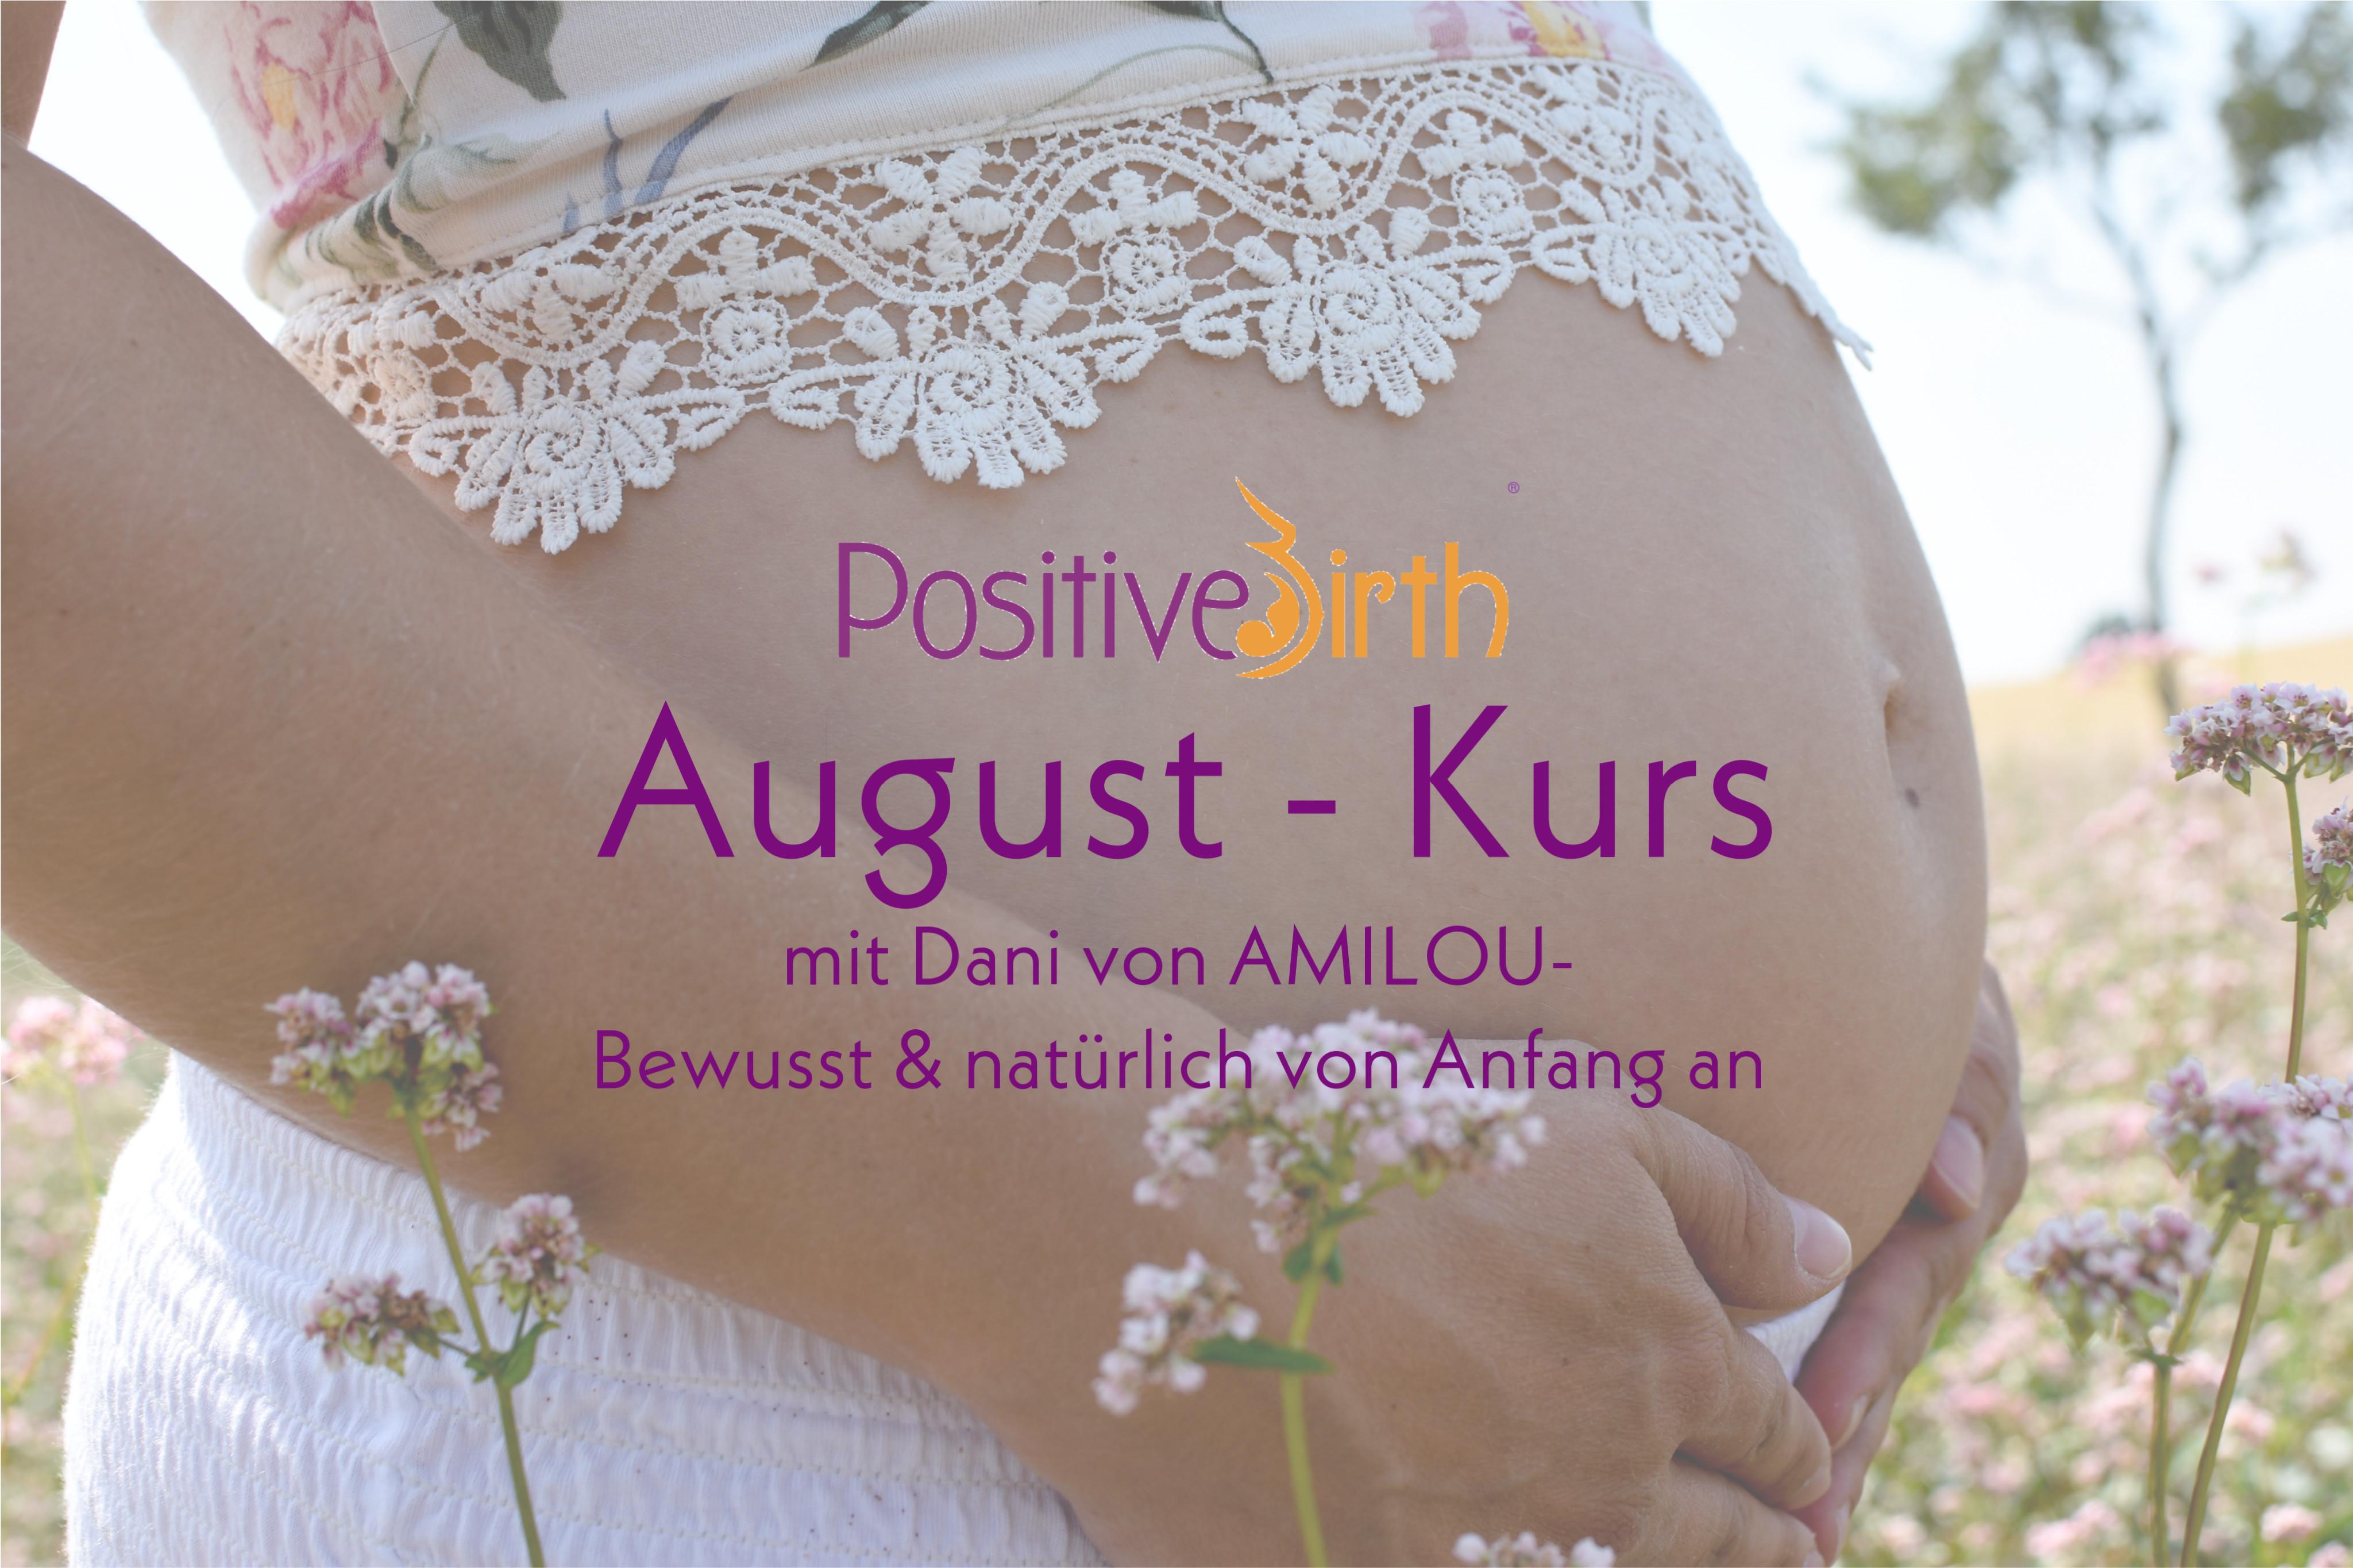 Positive Birth Kurs - August